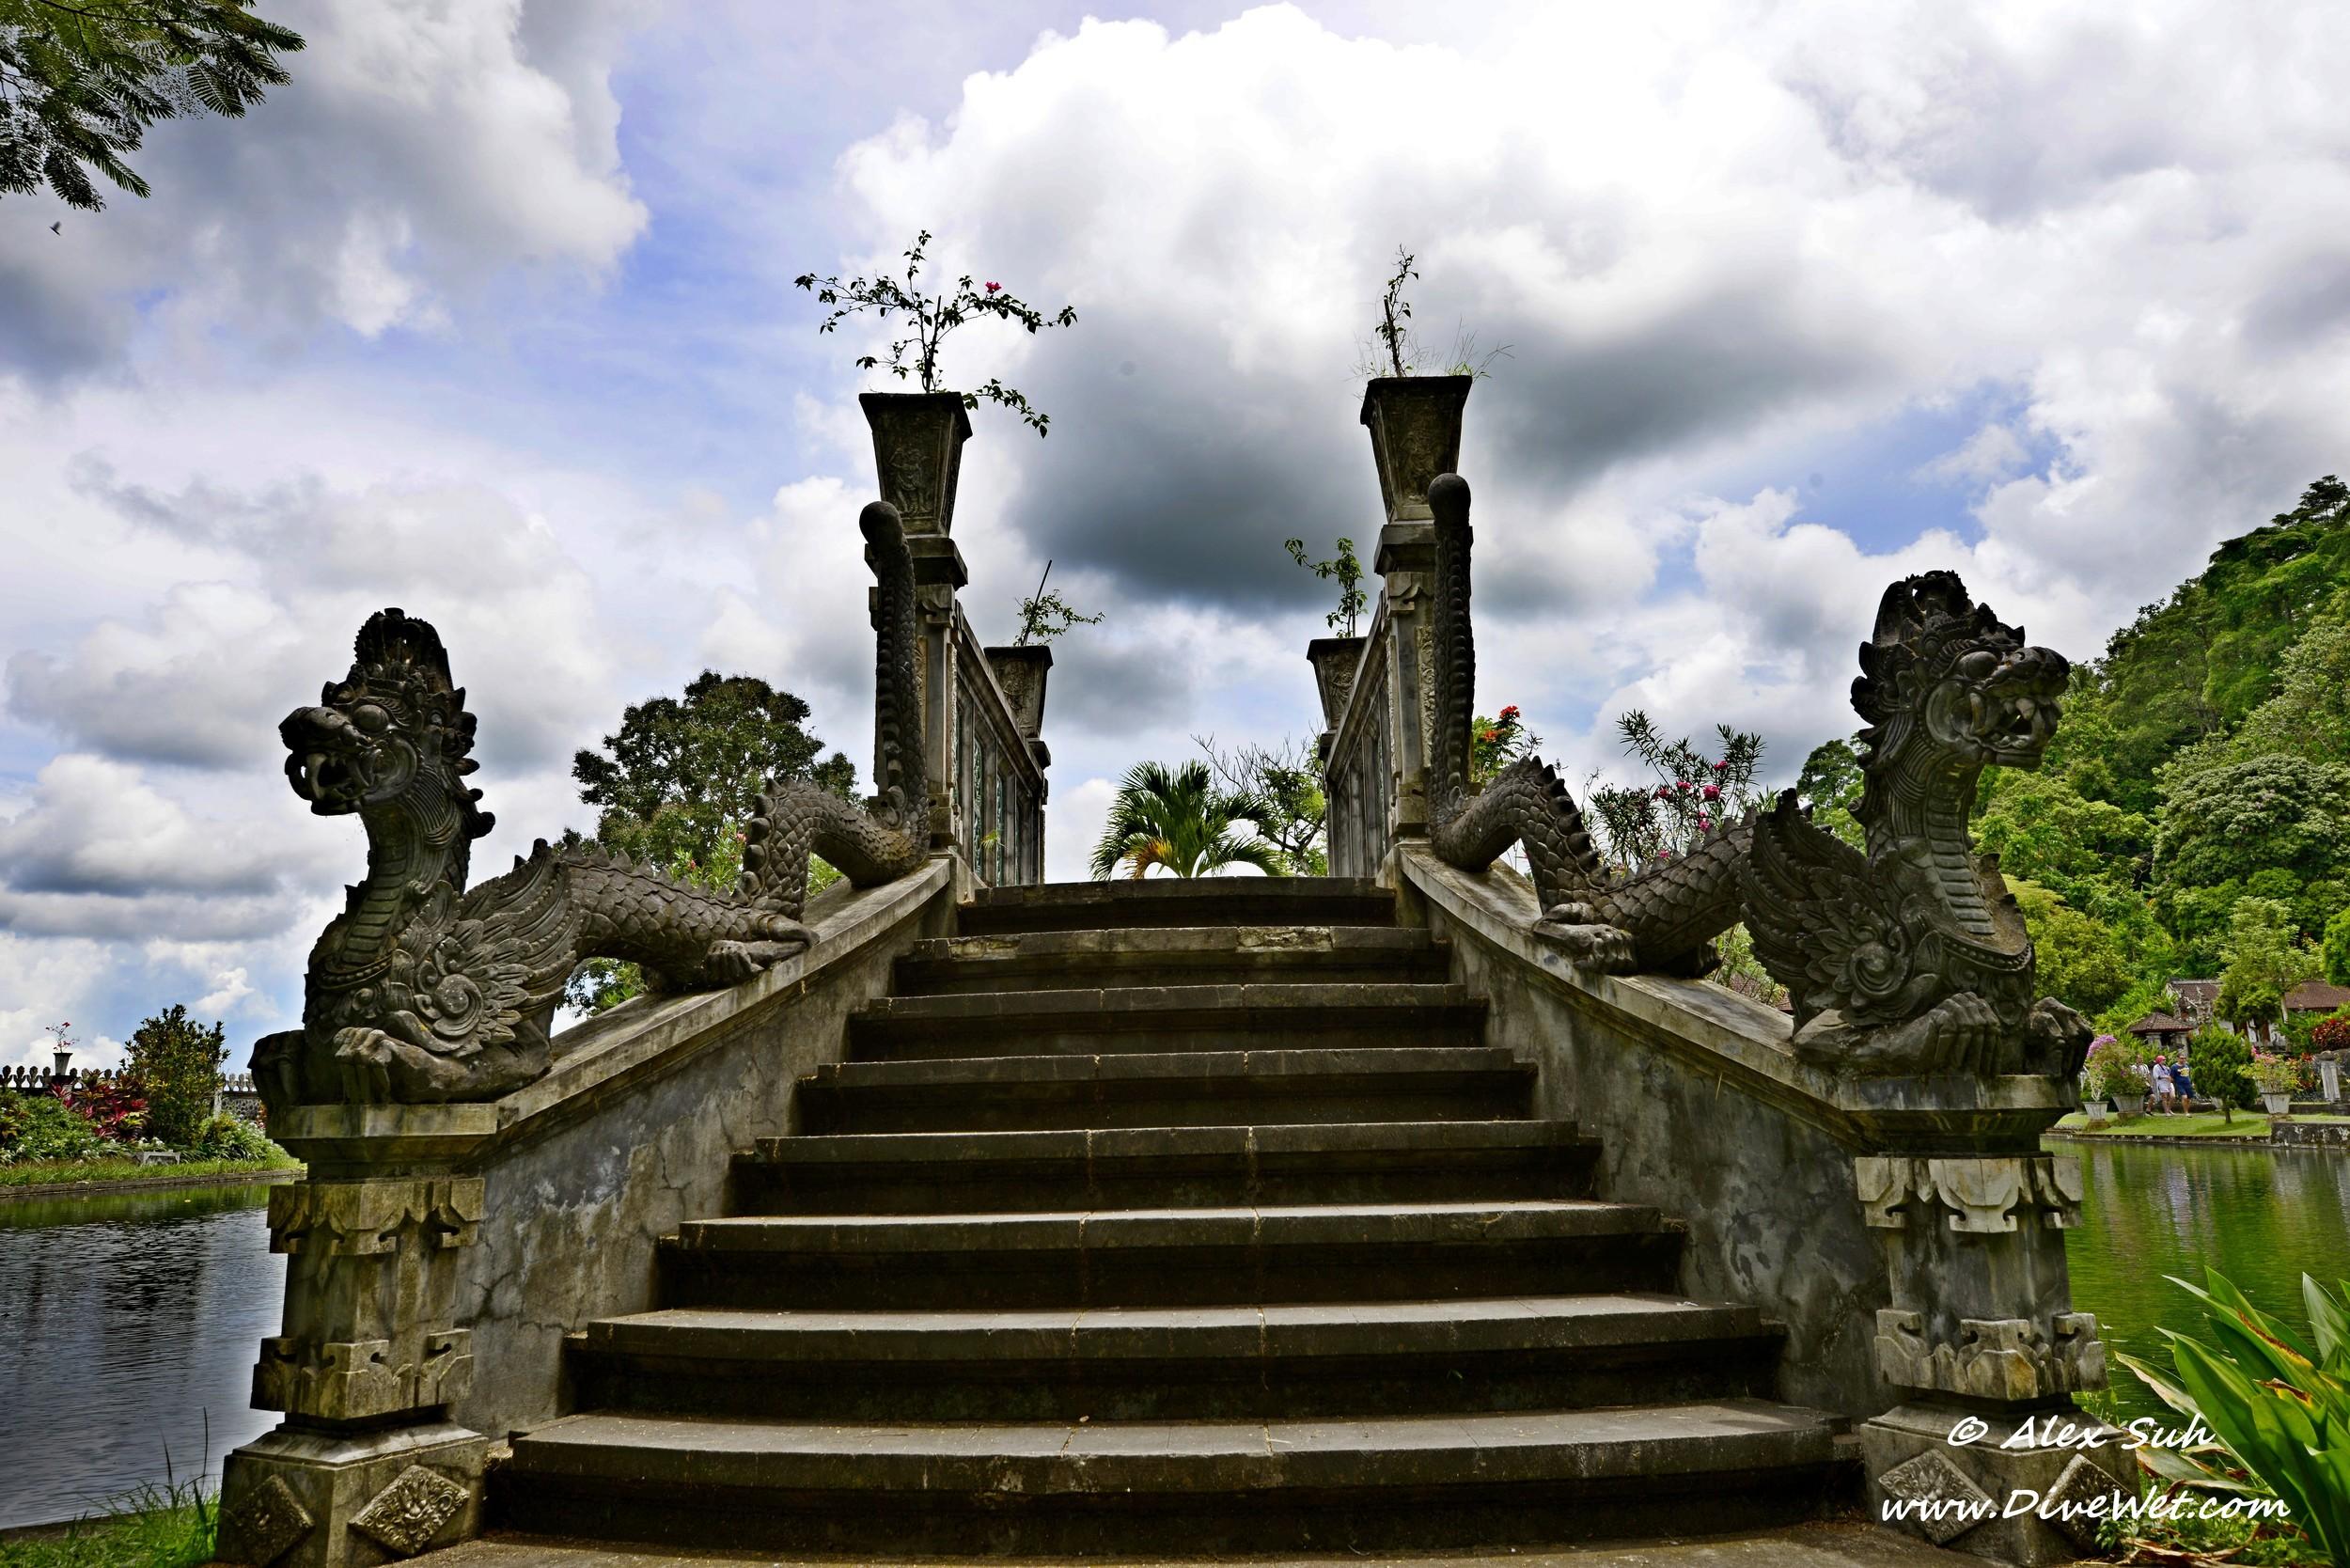 Bali Dragon Bridge Stairs.jpg